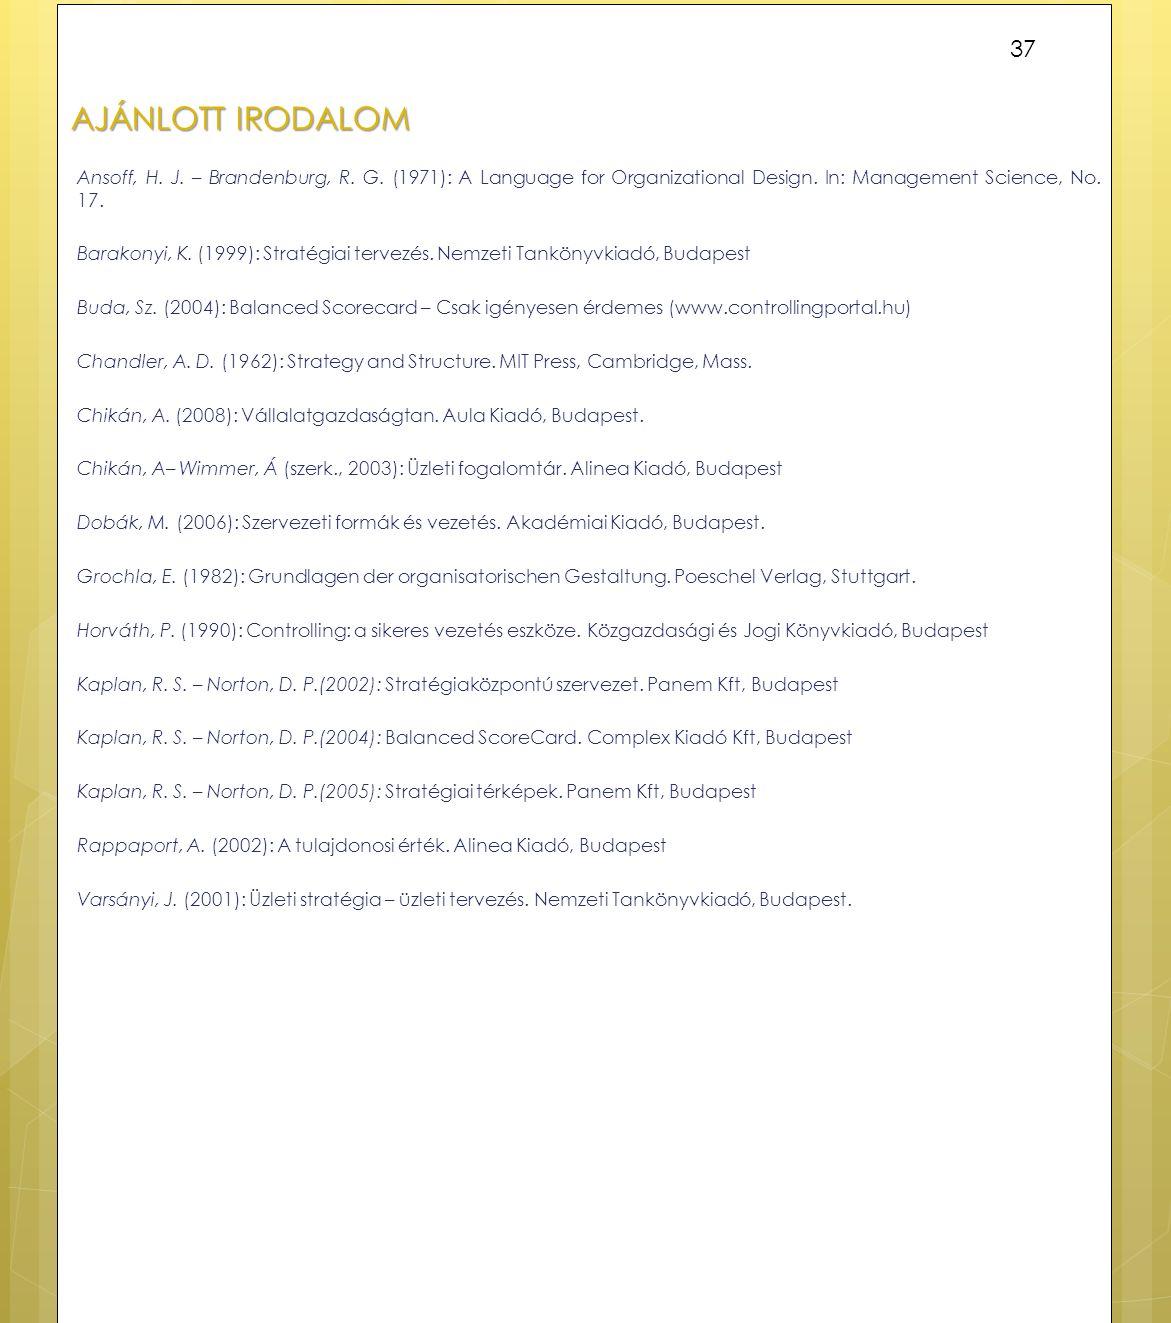 AJÁNLOTT IRODALOM Ansoff, H. J. – Brandenburg, R. G. (1971): A Language for Organizational Design. In: Management Science, No. 17. Barakonyi, K. (1999